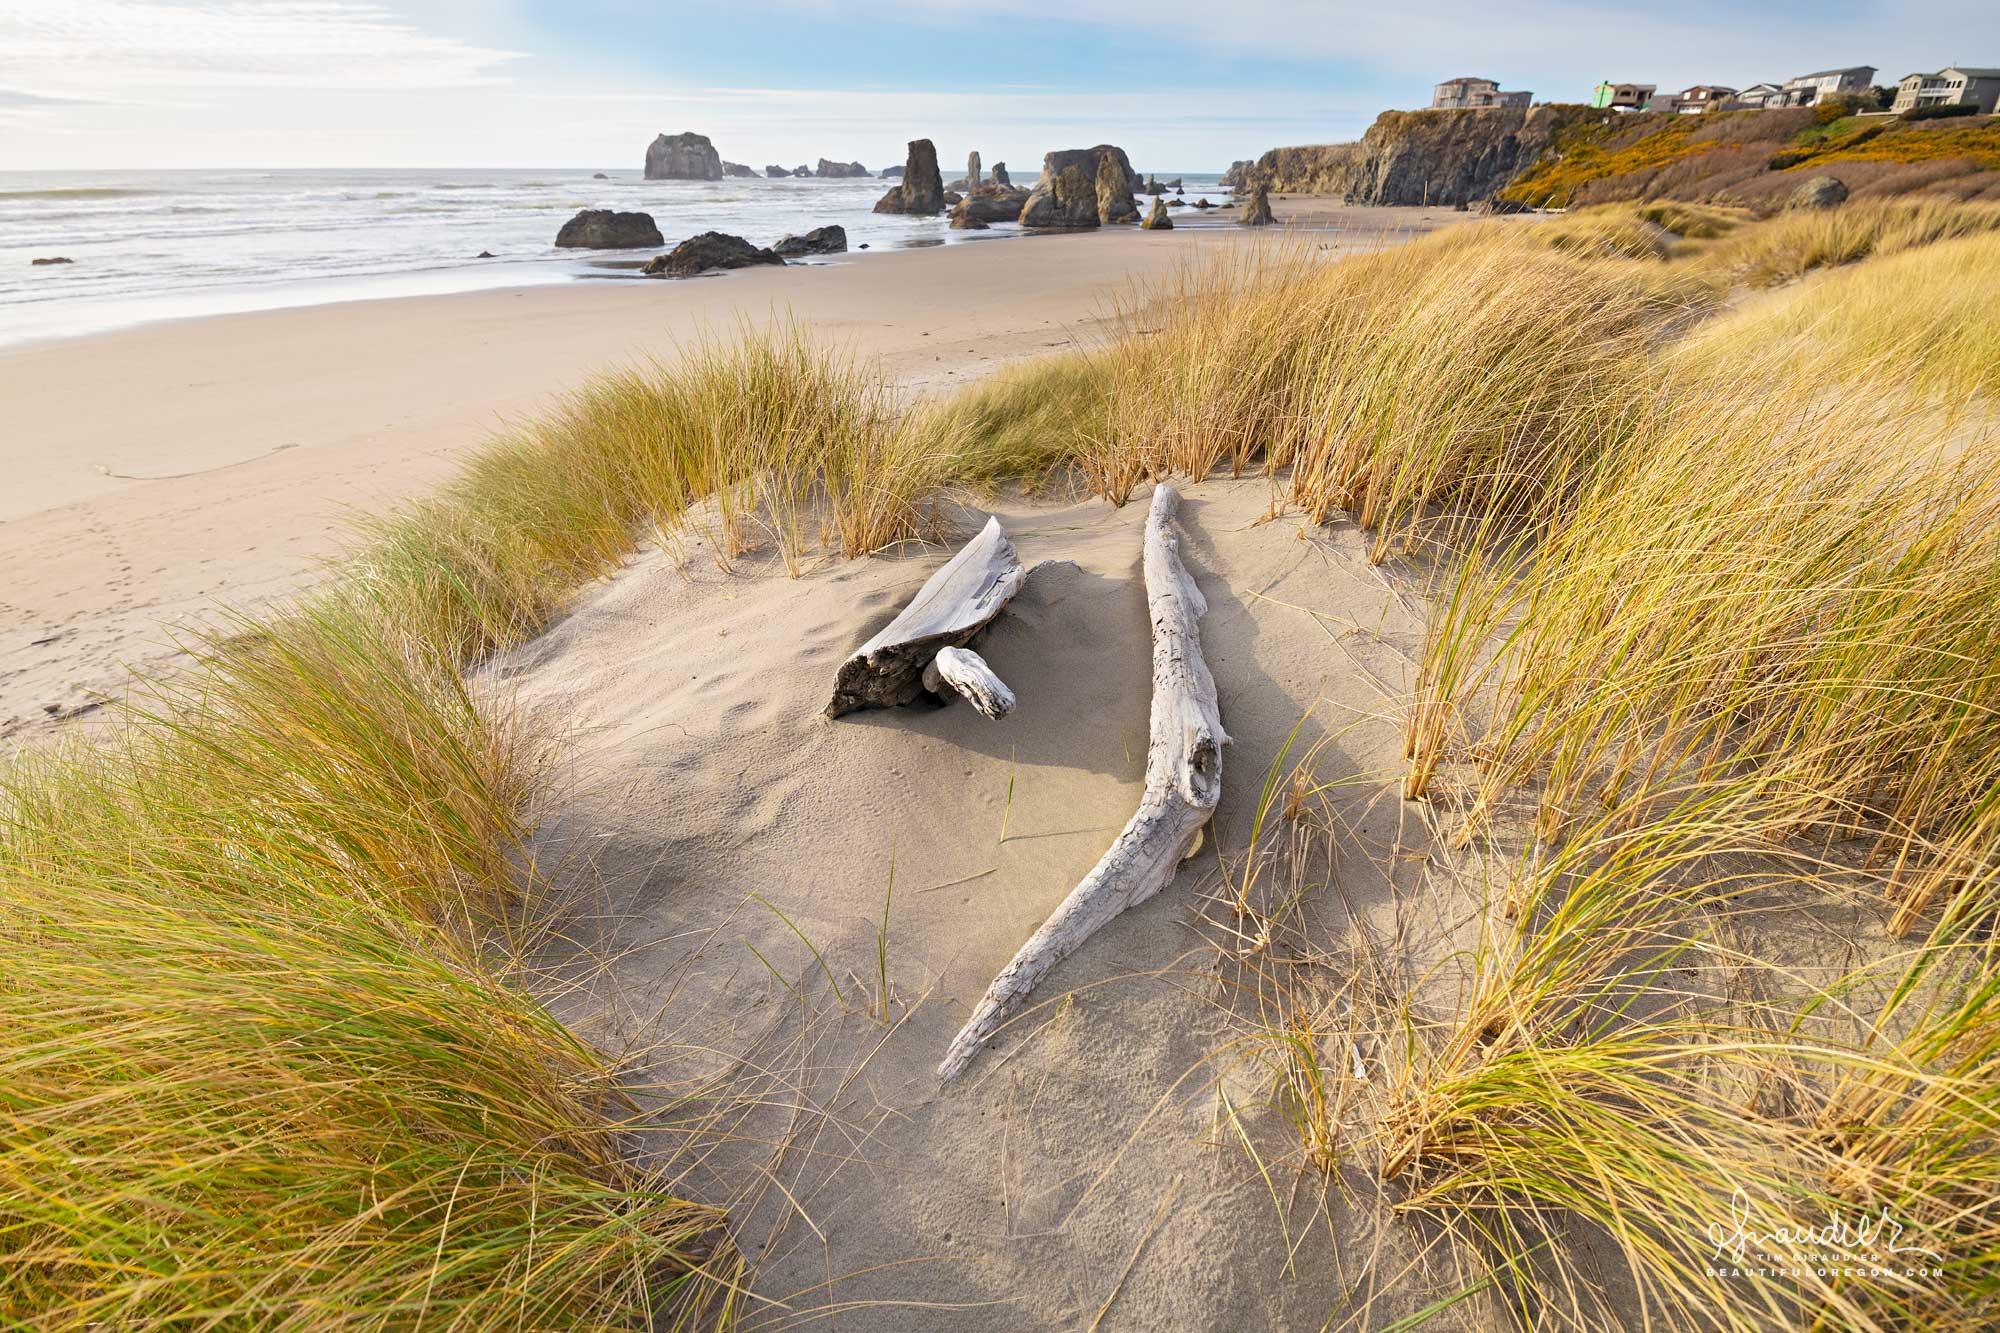 Dune grass and driftwood at Bandon Beach. Coos County, Bandon on Oregon south coast.